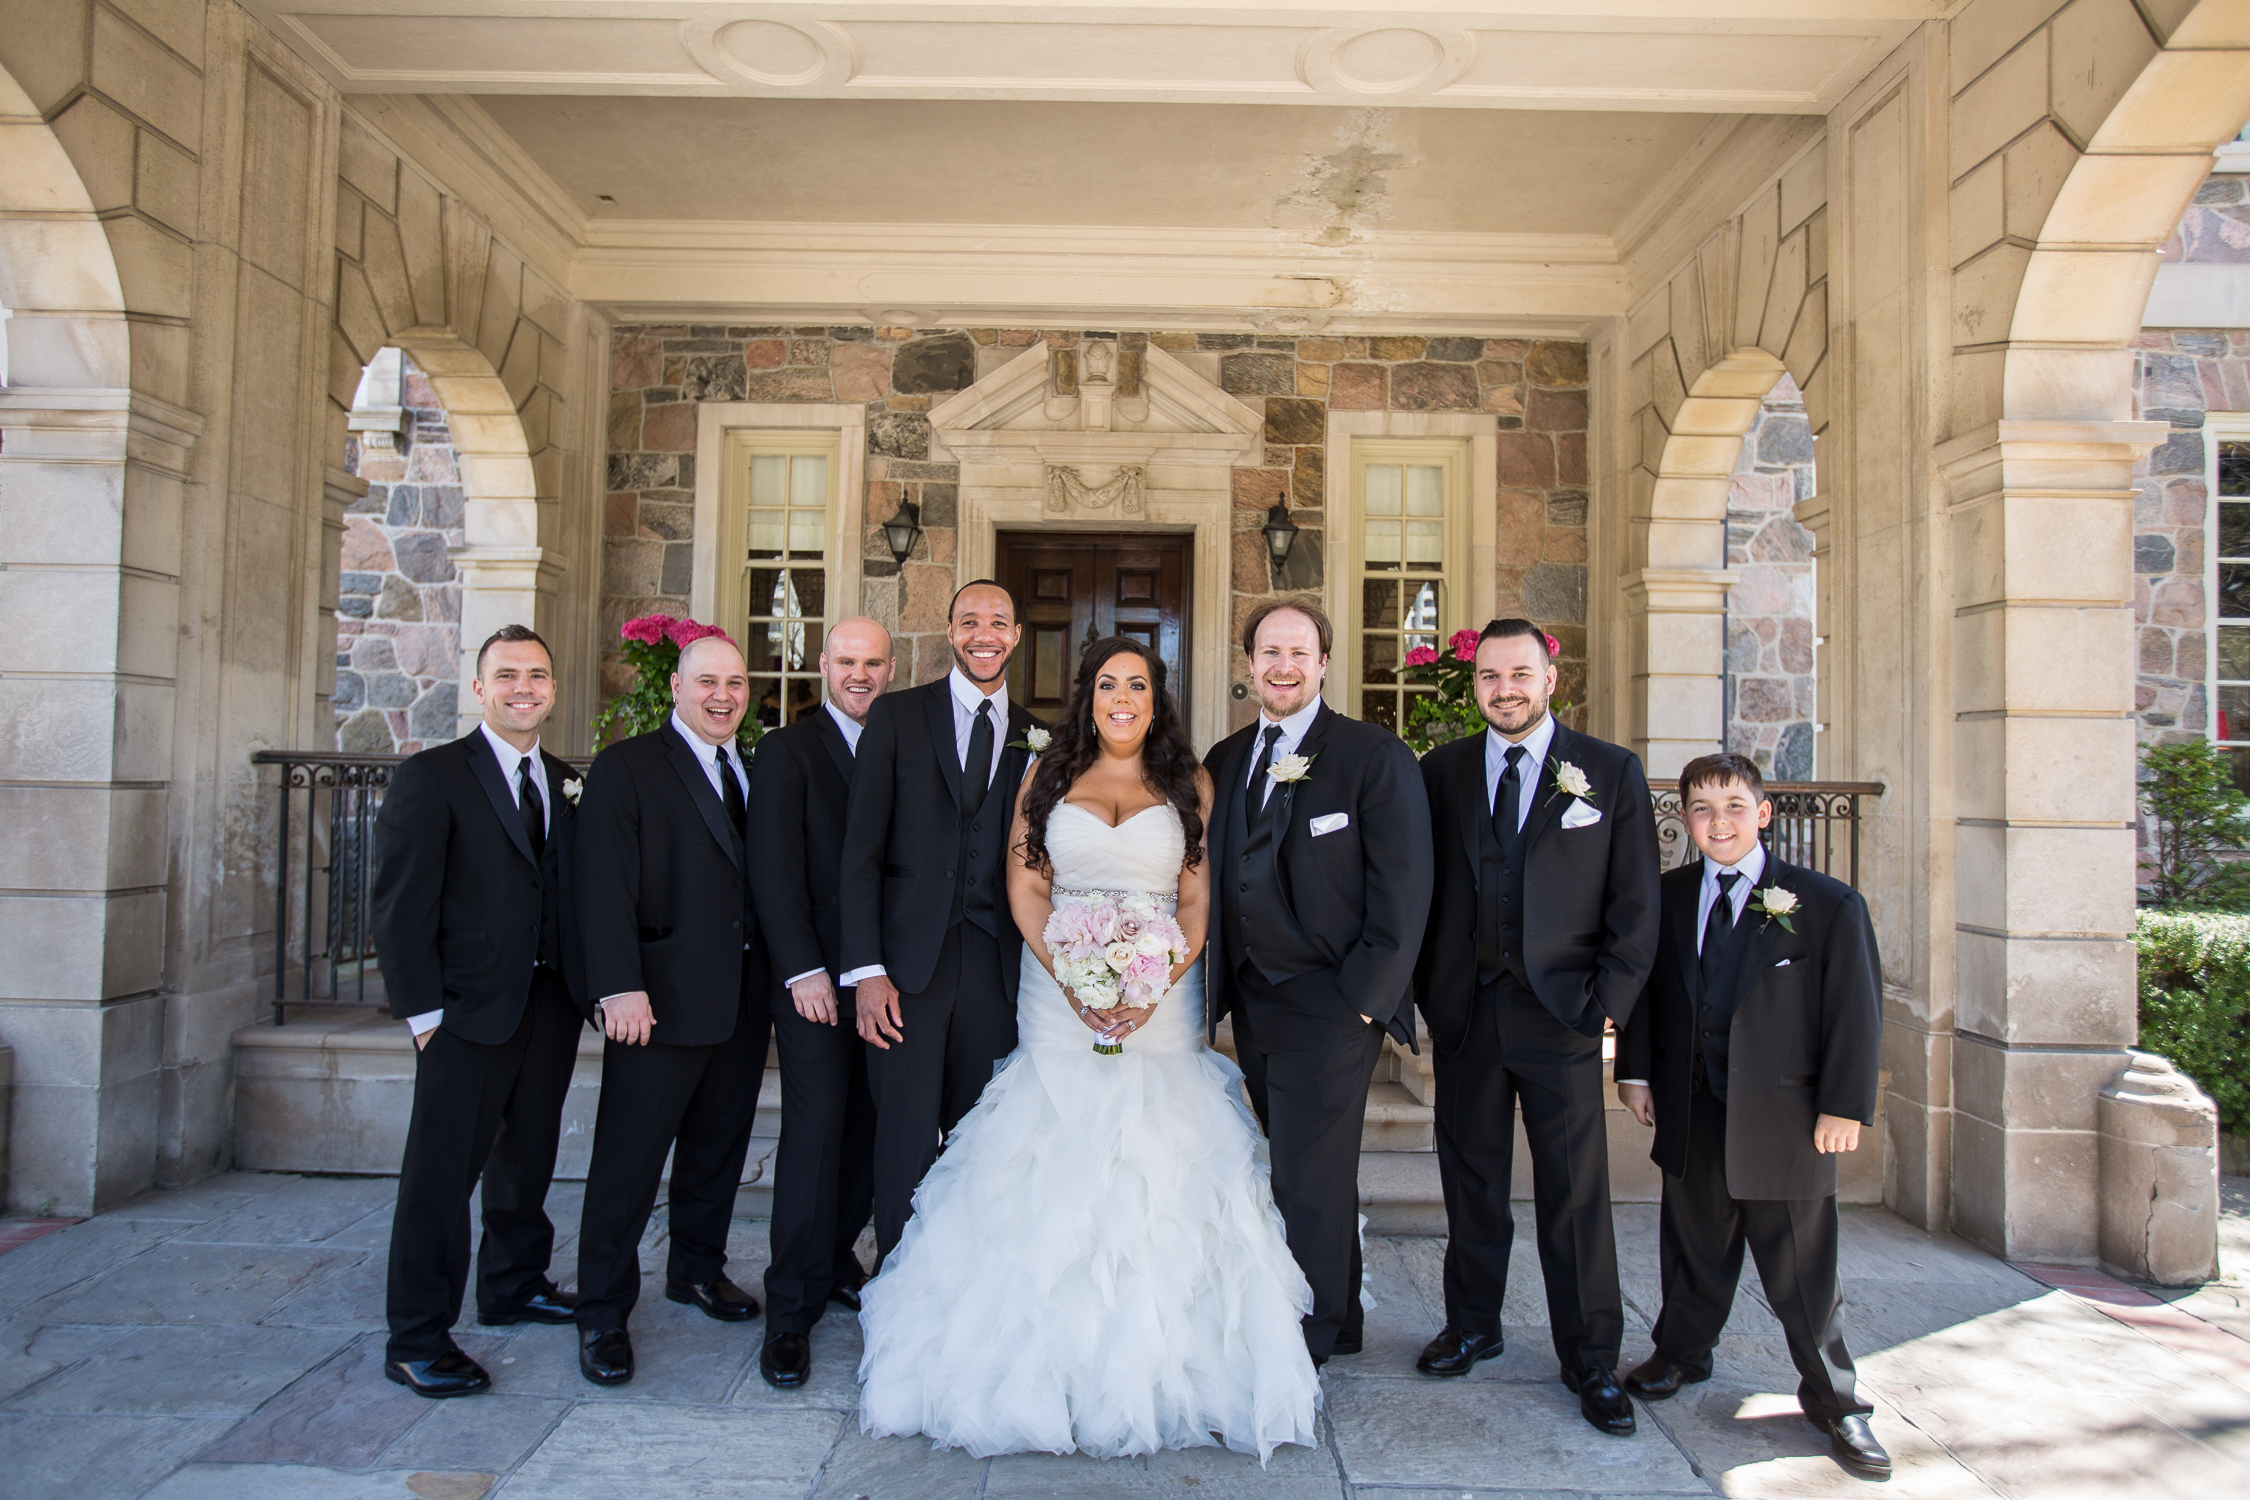 Peter-and-Marie-Wedding-Fontana-Primavera-Graydon-Hall-Manor-Toronto-Ontario-Canada-0026.jpg